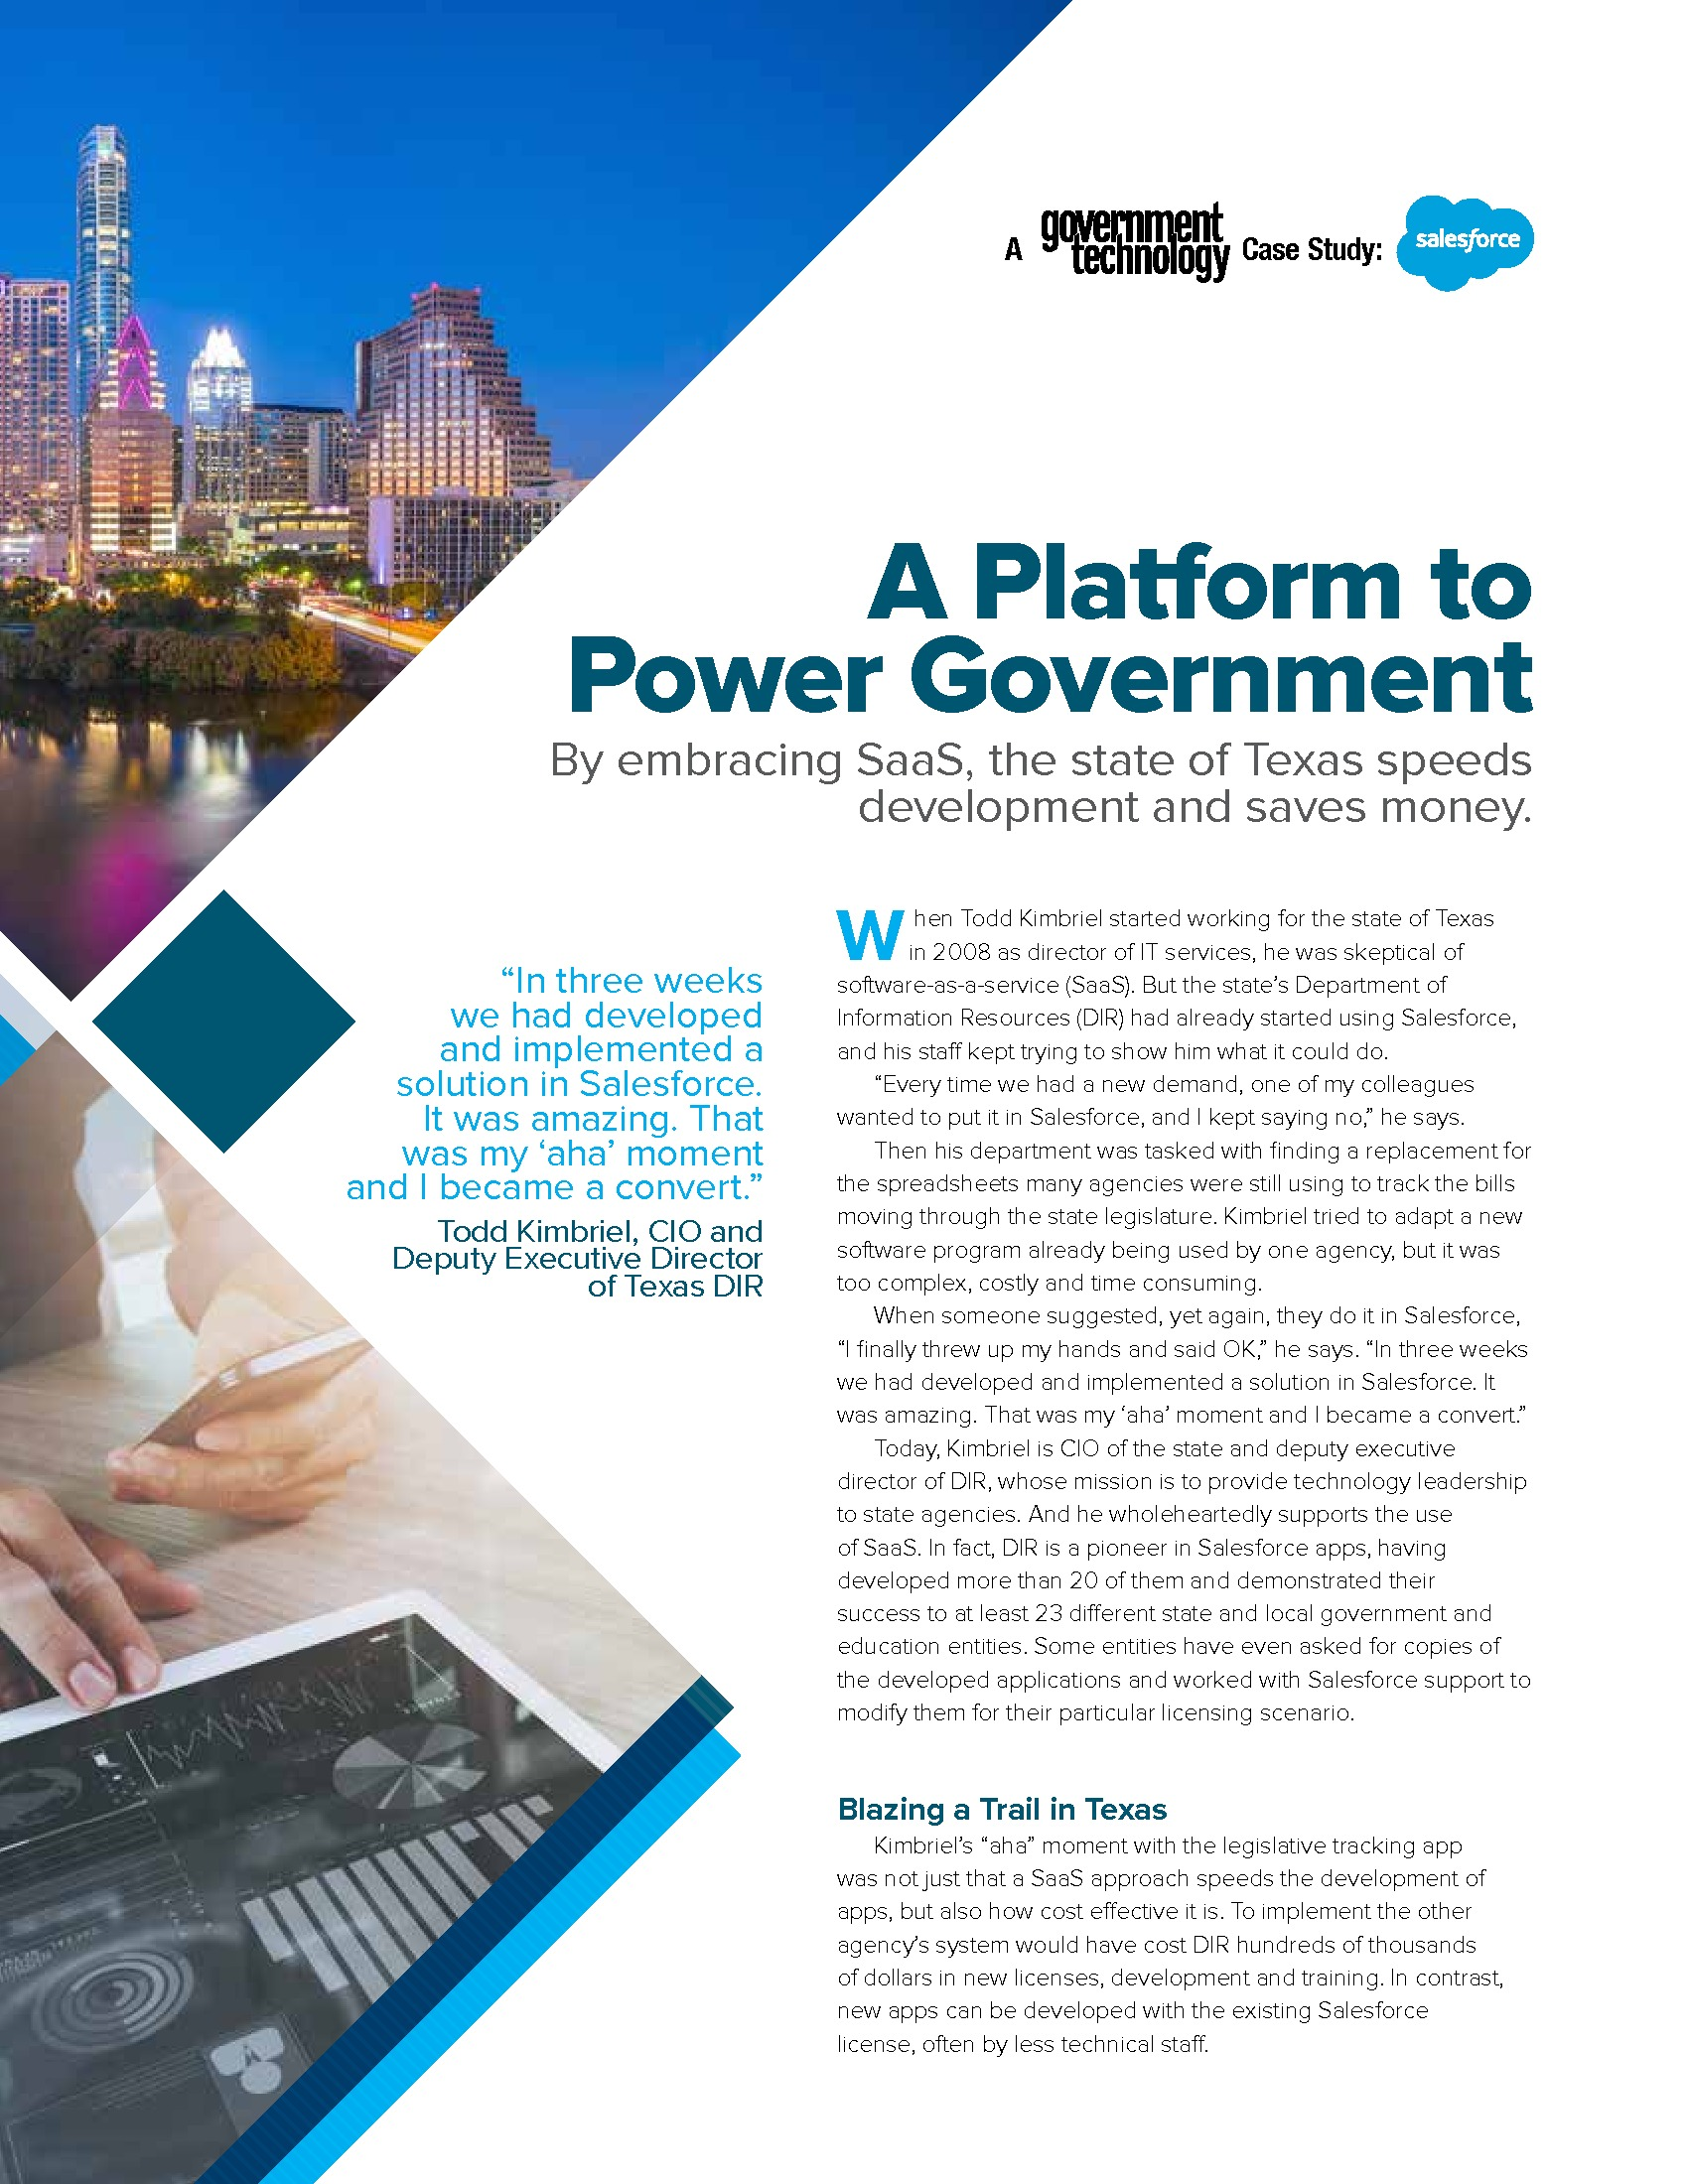 GT - Salesforce - Case Study - 180720 - A Platform to Power Government